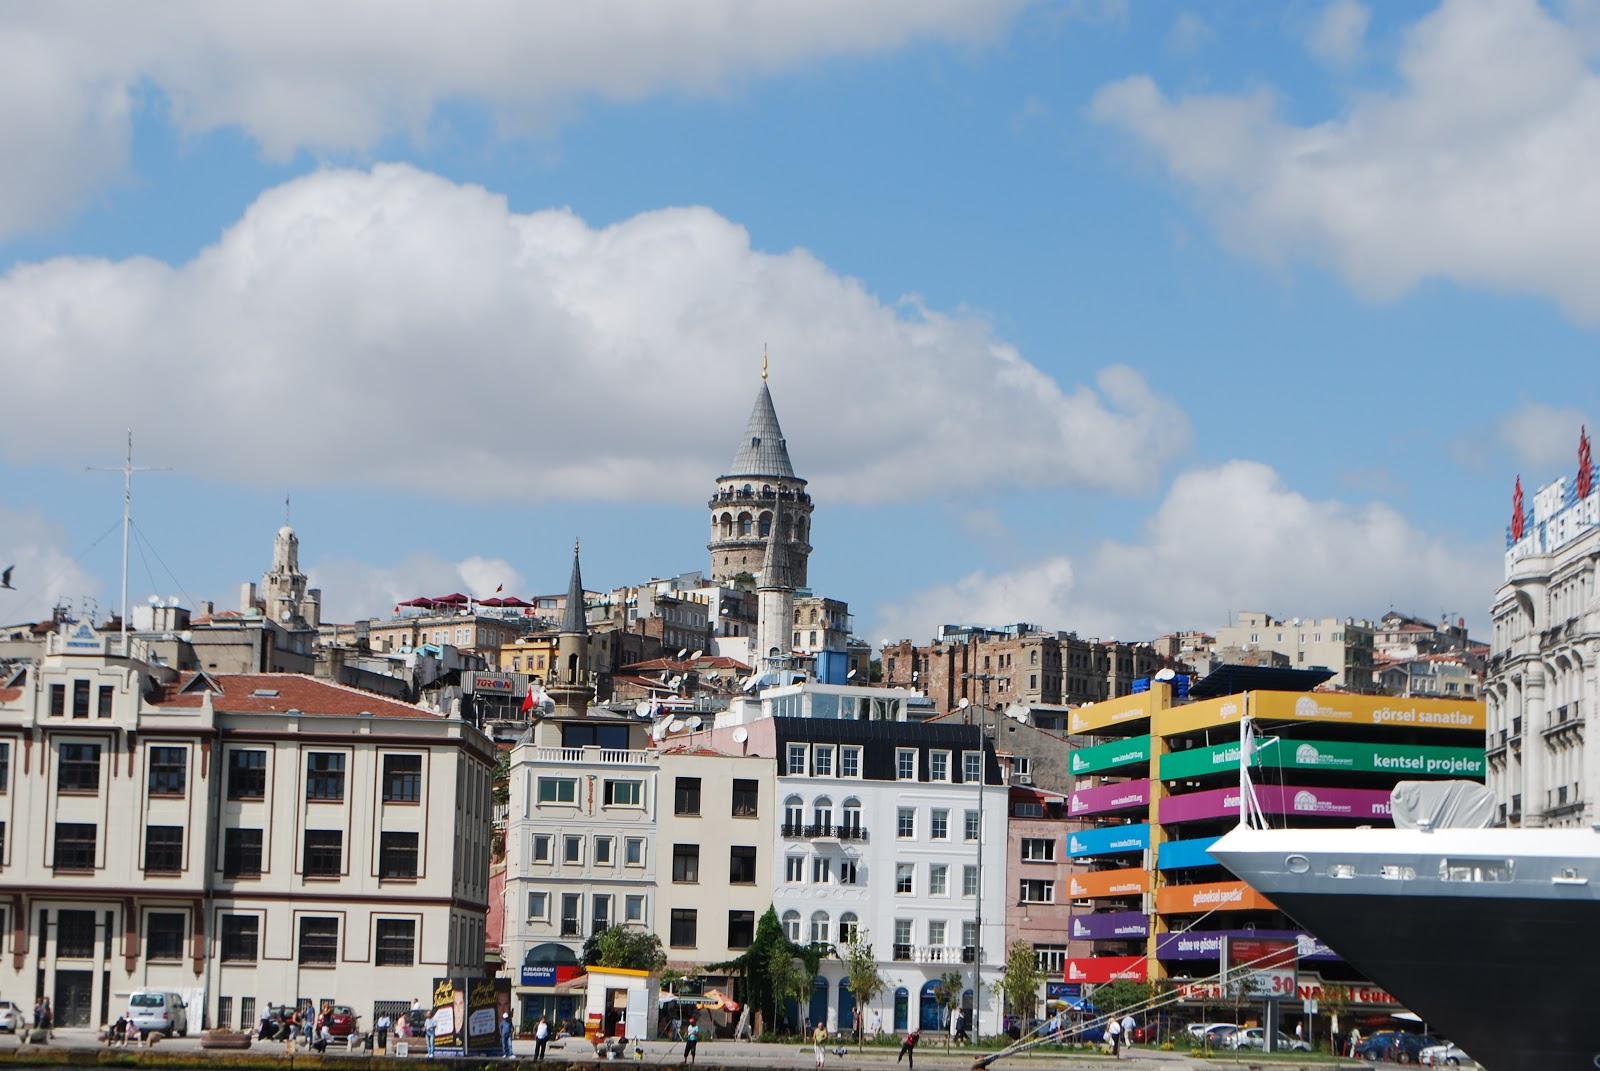 http://1.bp.blogspot.com/_pv5ccRkAhck/TKE9PEcfMDI/AAAAAAAABg8/AyRkHH6Qq0M/s1600/Bosphorus+Cruise+%2813%29.JPG